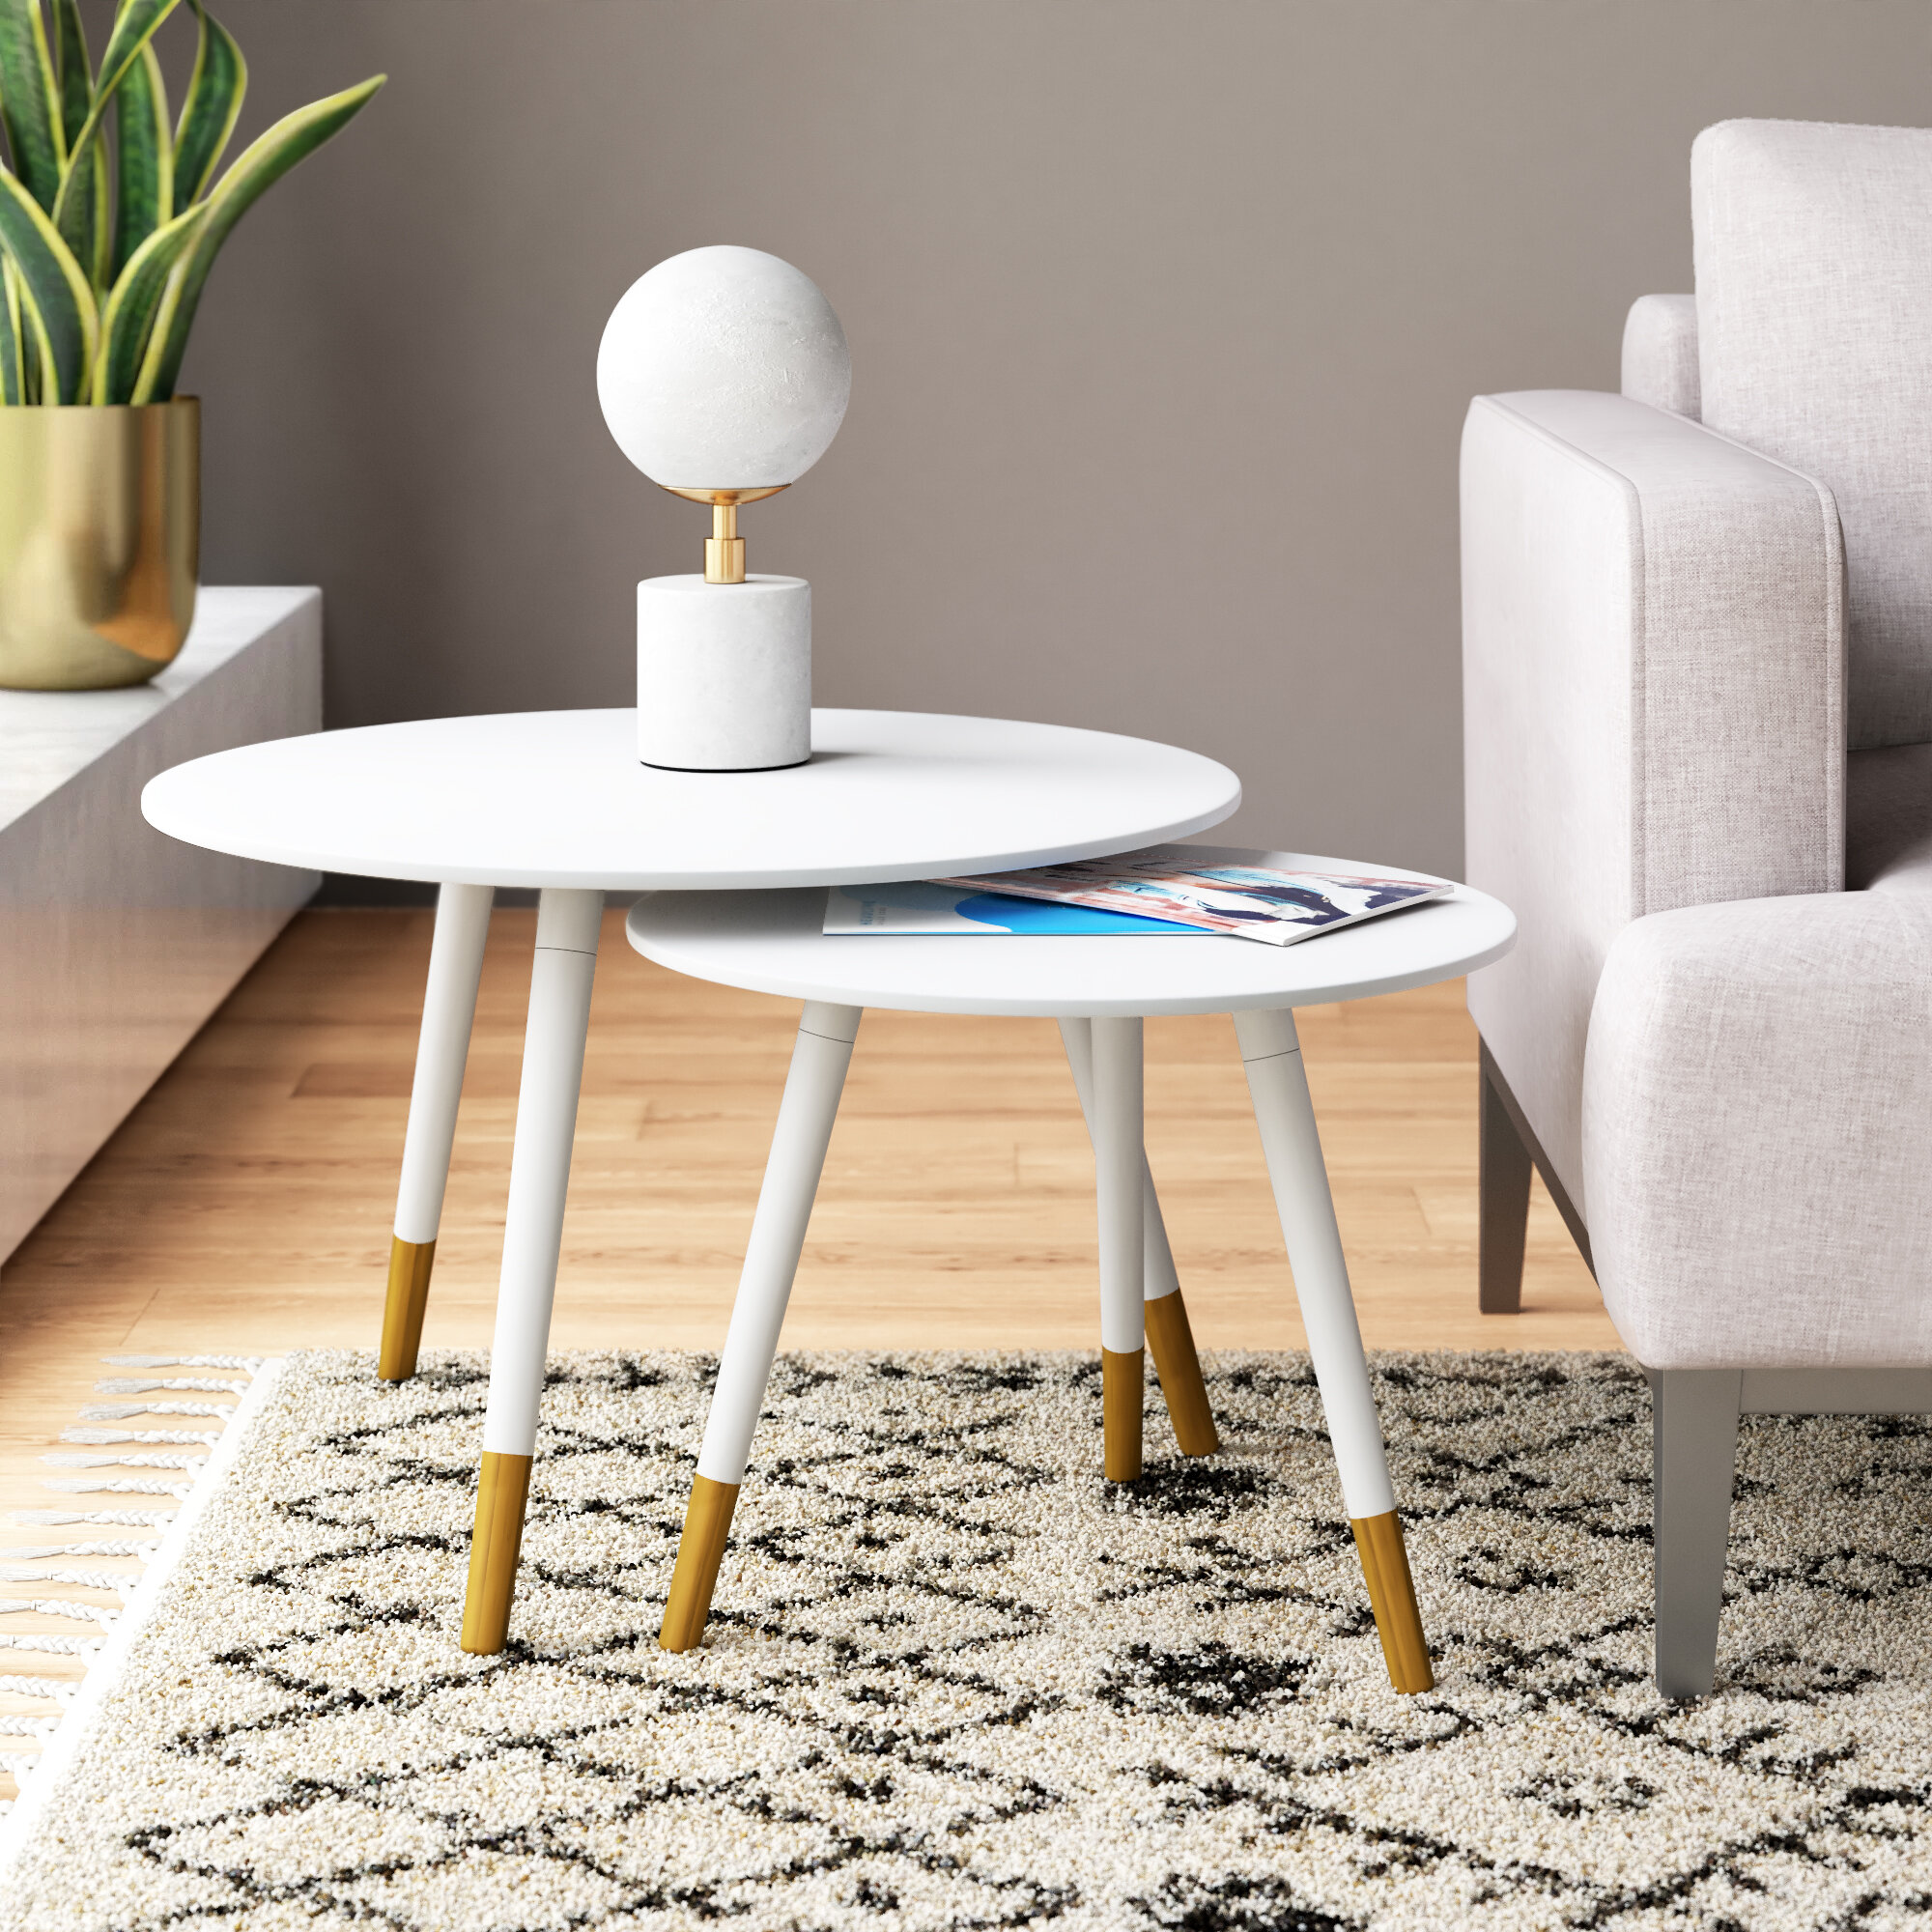 Demeter 2 Piece Nesting Tables Reviews Allmodern